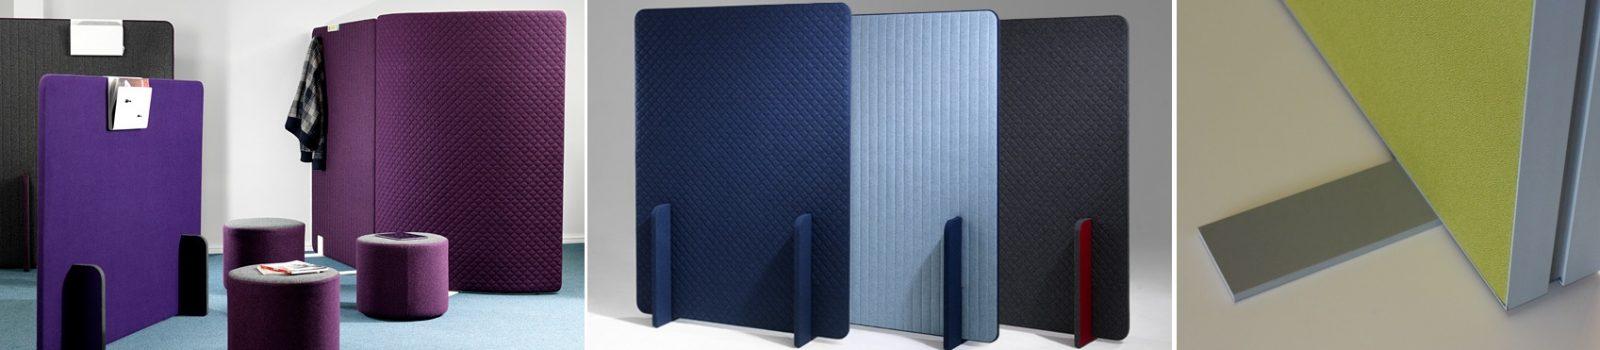 akustik-seperator-paravan-seperasyon-sistemleri